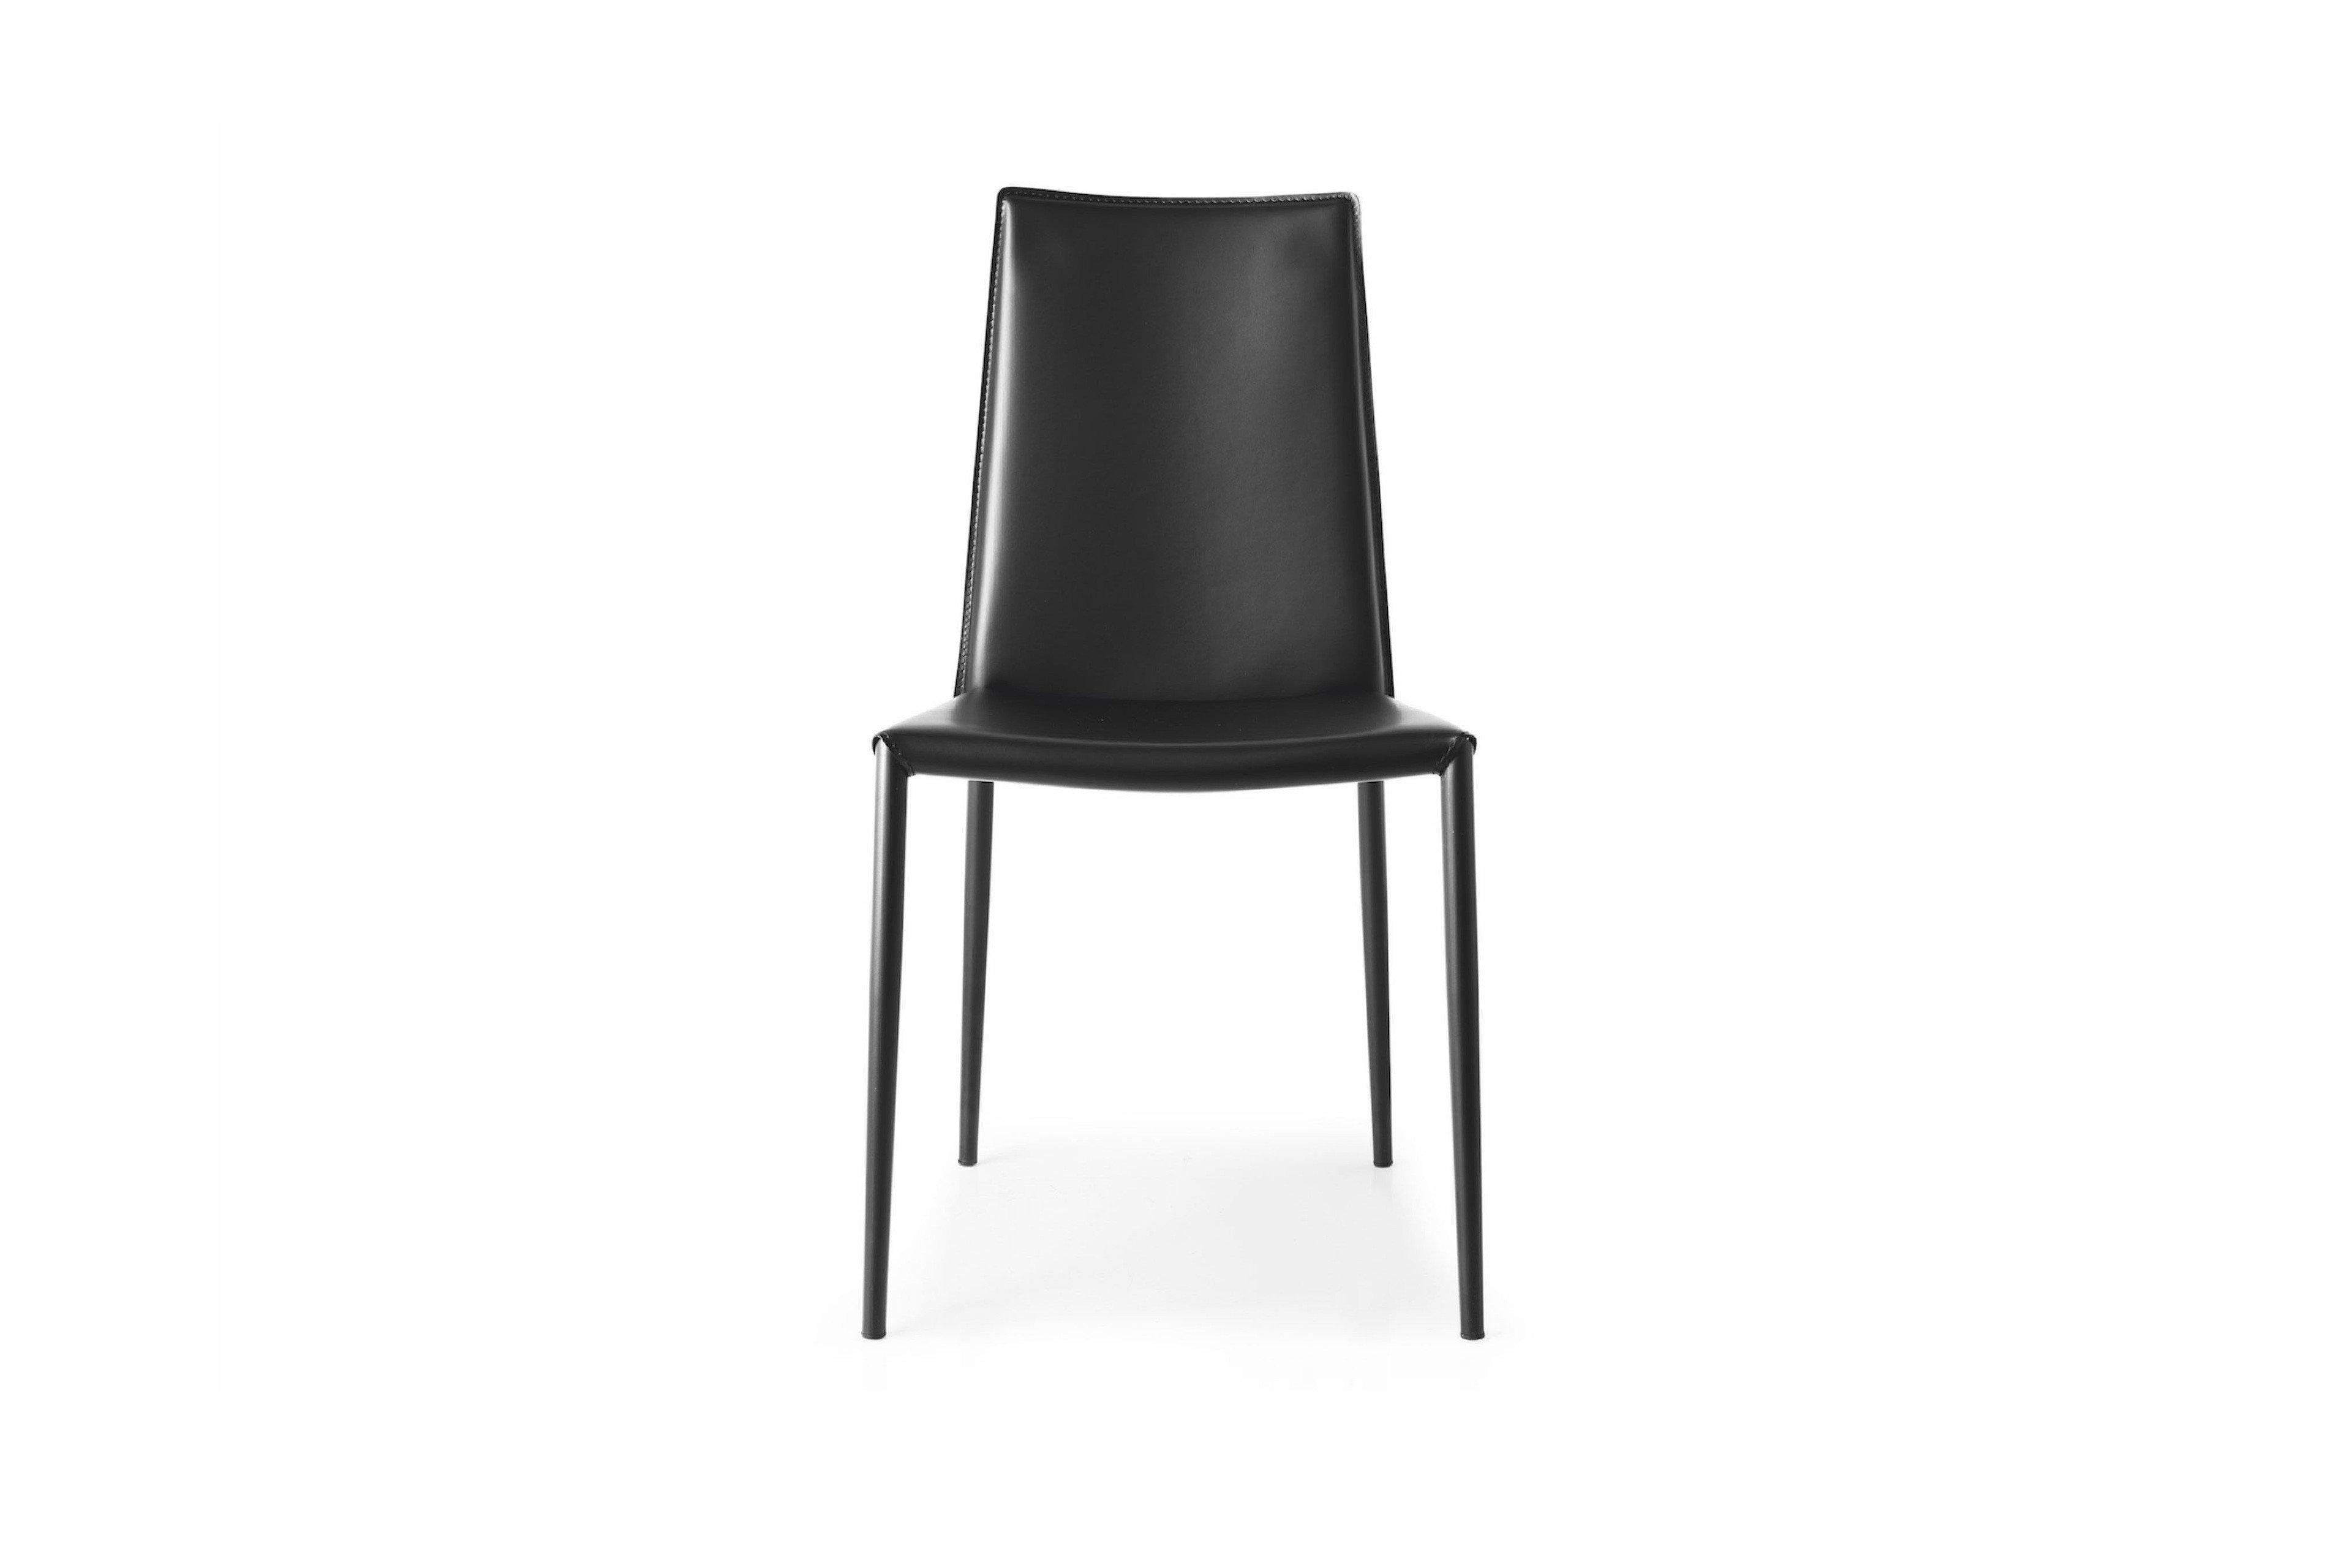 connubia by calligaris stuhl boheme schwarz m bel letz ihr online shop. Black Bedroom Furniture Sets. Home Design Ideas